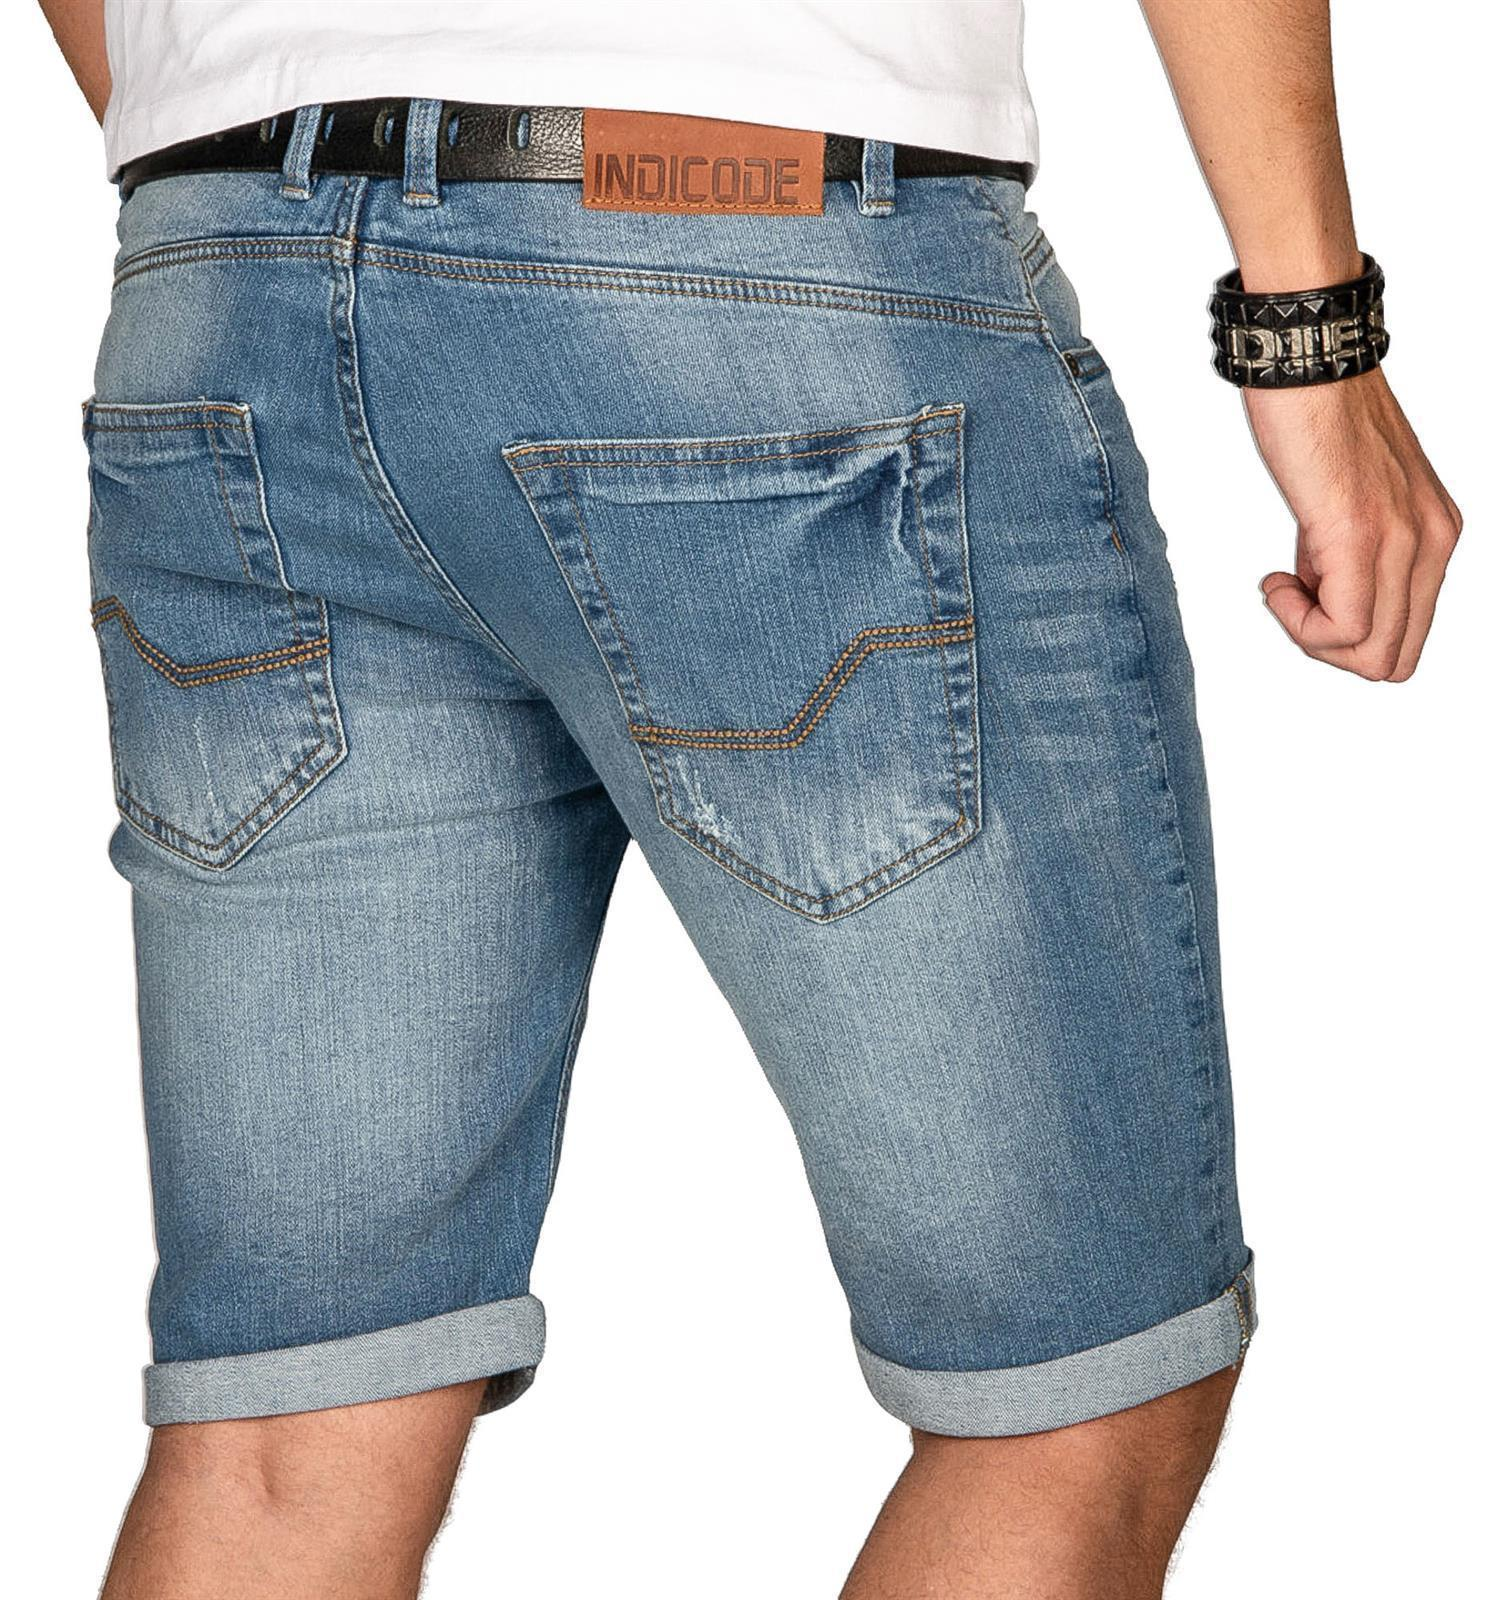 Indicode-Herren-Sommer-Bermuda-Jeans-Shorts-kurze-Hose-Sommerhose-Short-Neu-B556 Indexbild 12